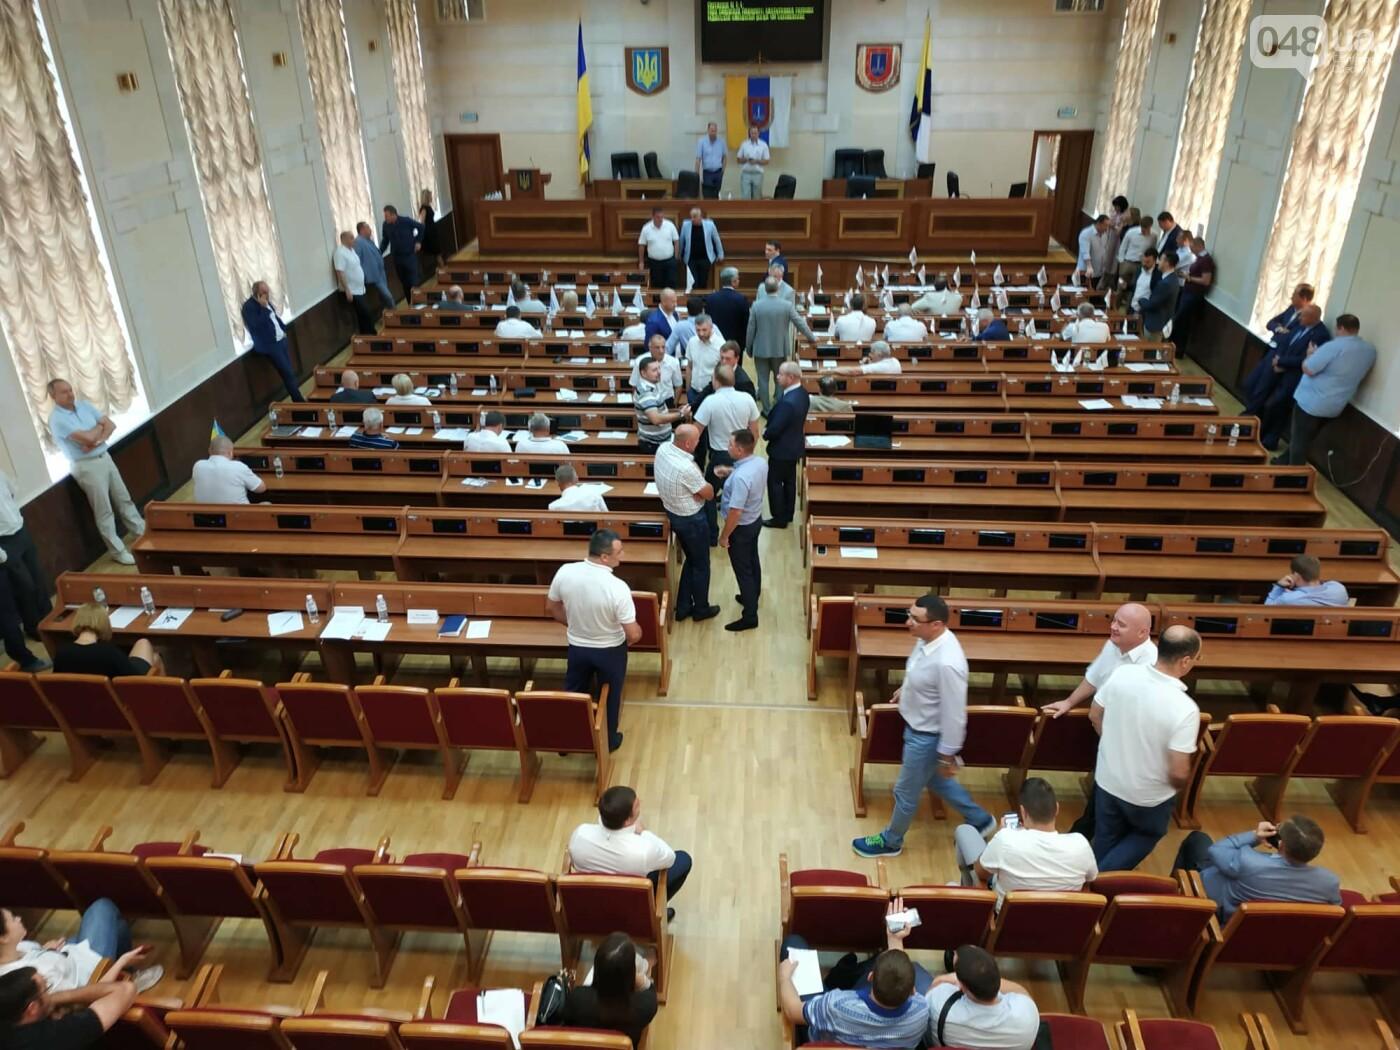 Стало известно, кто возглавил Одесский областной совет, - ФОТО, фото-1, Фото: Александр Жирносенко